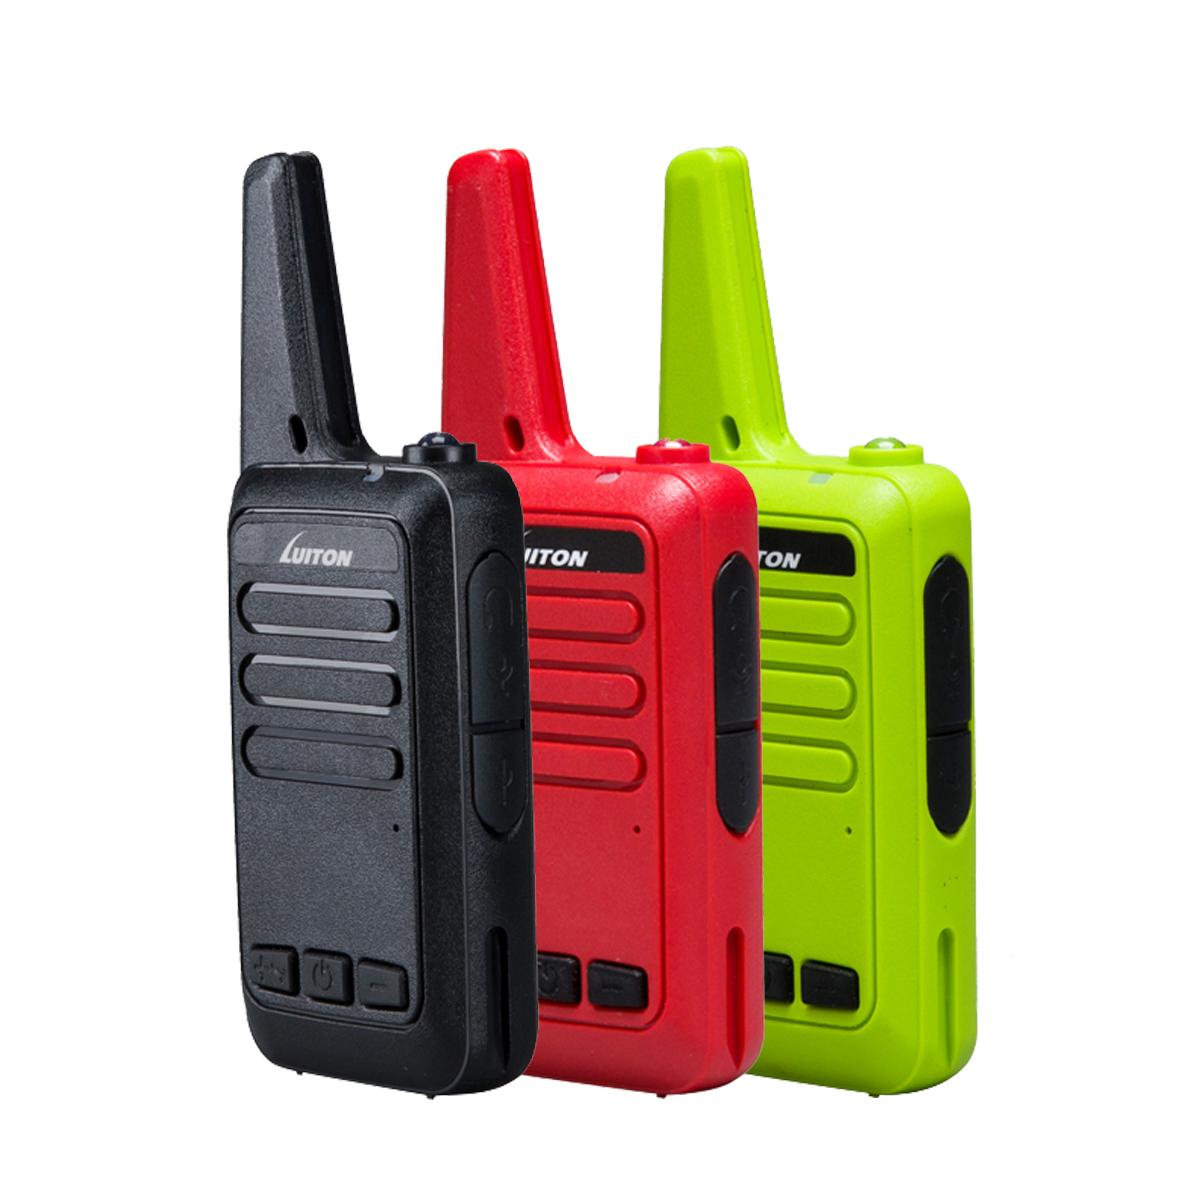 LT-216 UHF 400-470 MHz MINI-handheld 2W Walkie Talkie - LUITON